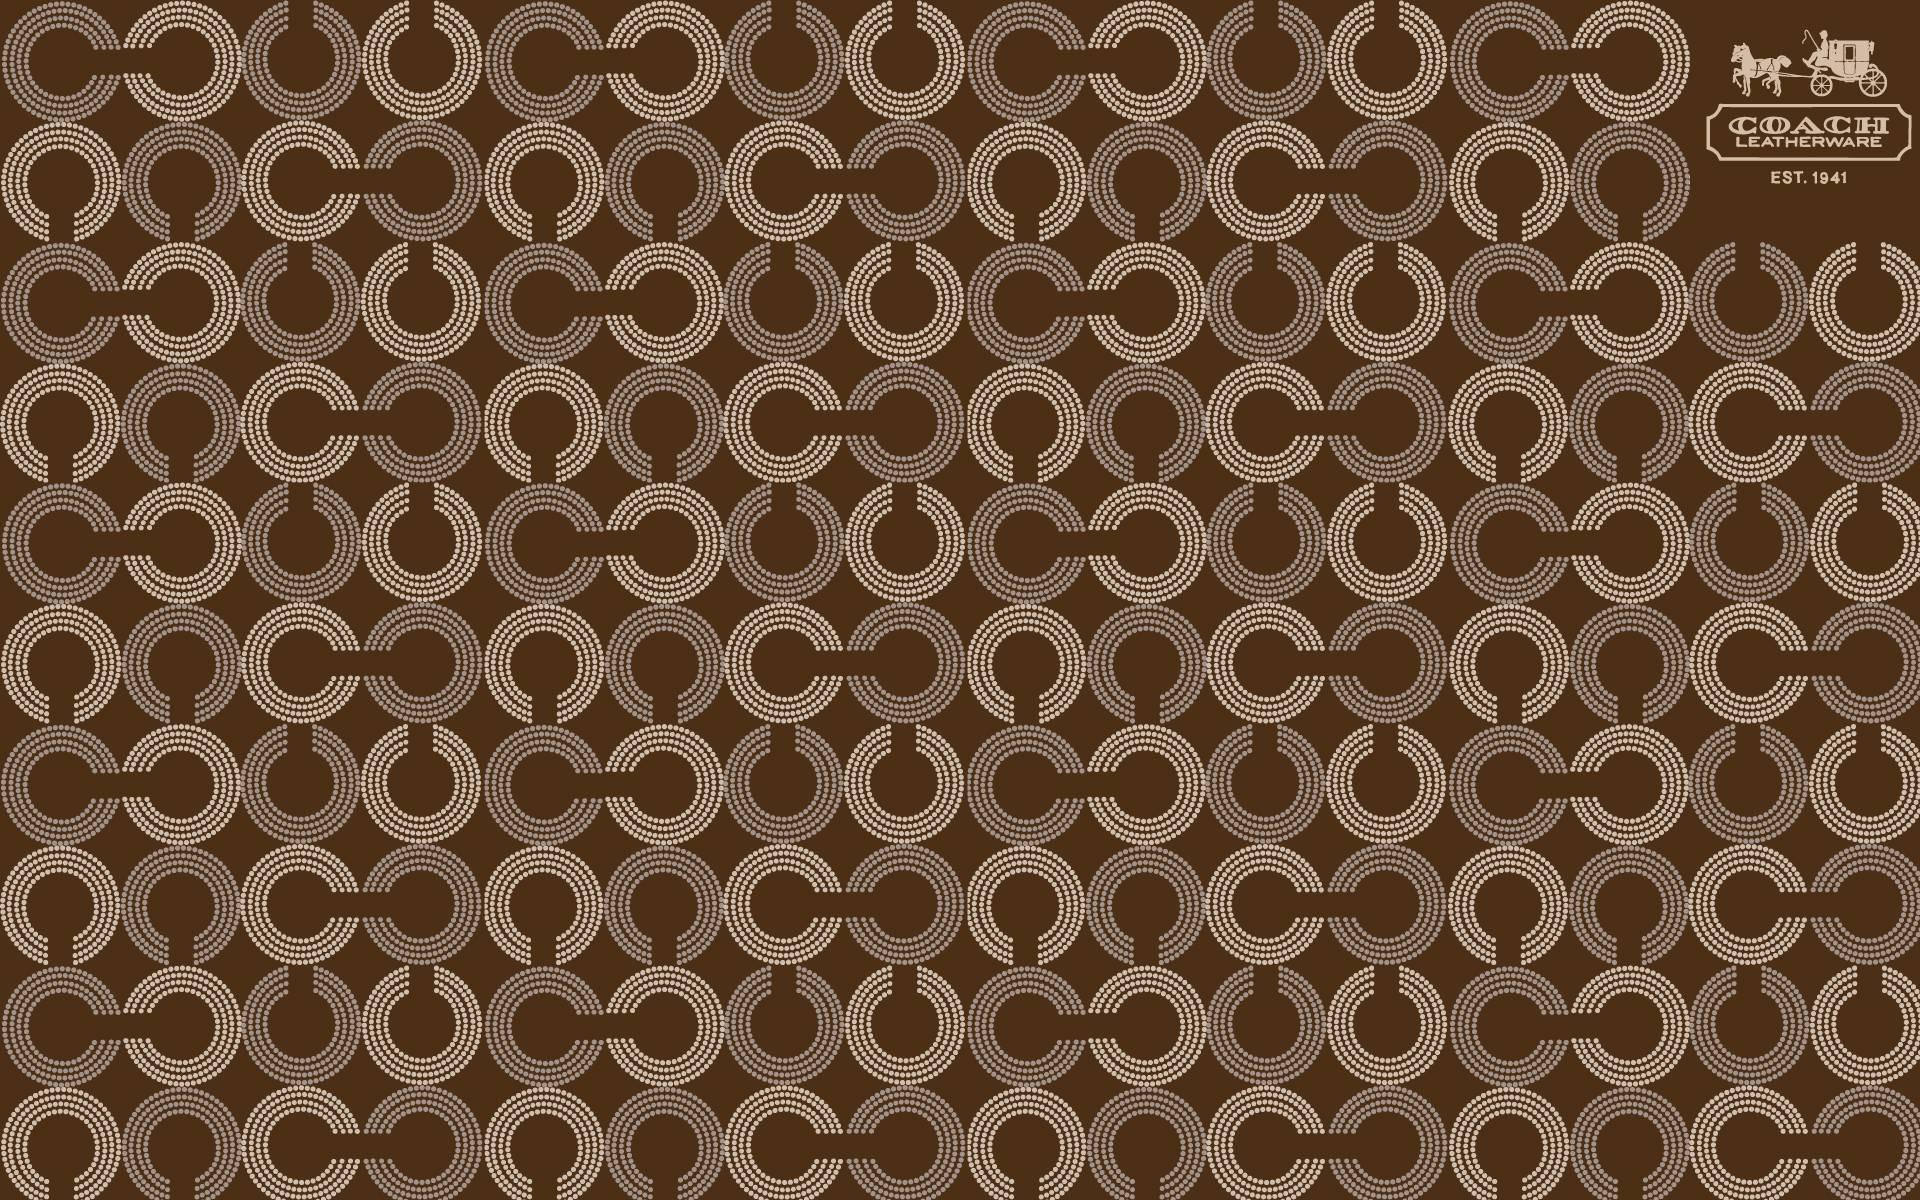 Coach Desktop Wallpapers Top Free Coach Desktop Backgrounds Wallpaperaccess